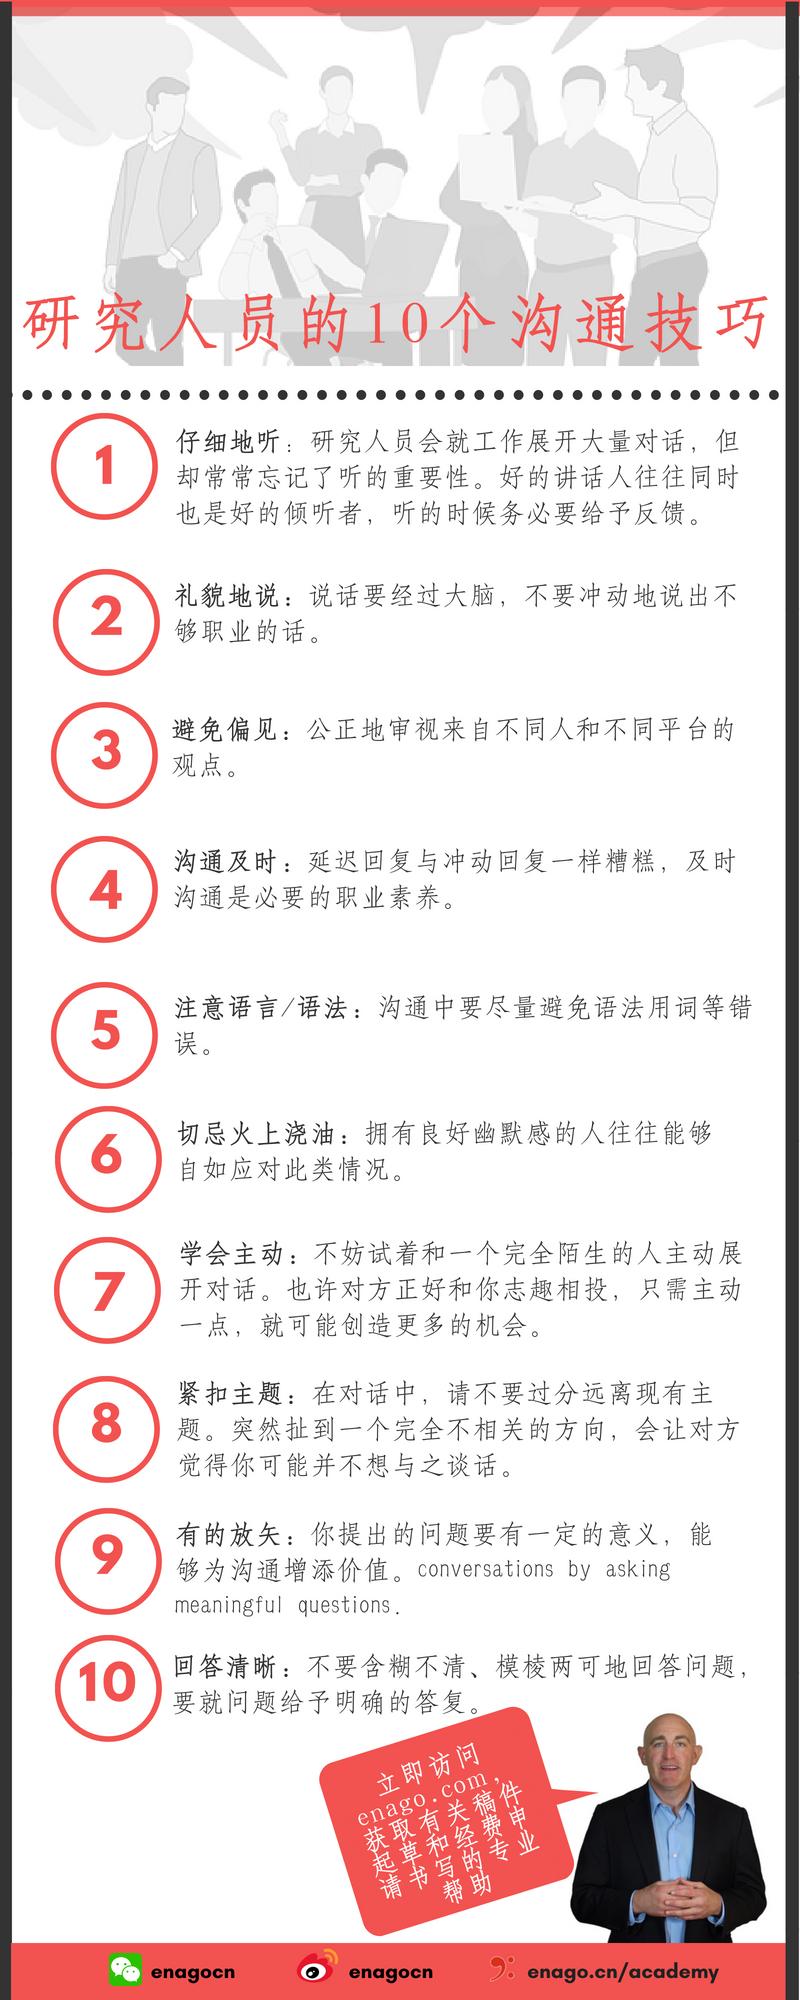 CommunicationTipsForResearchers_China